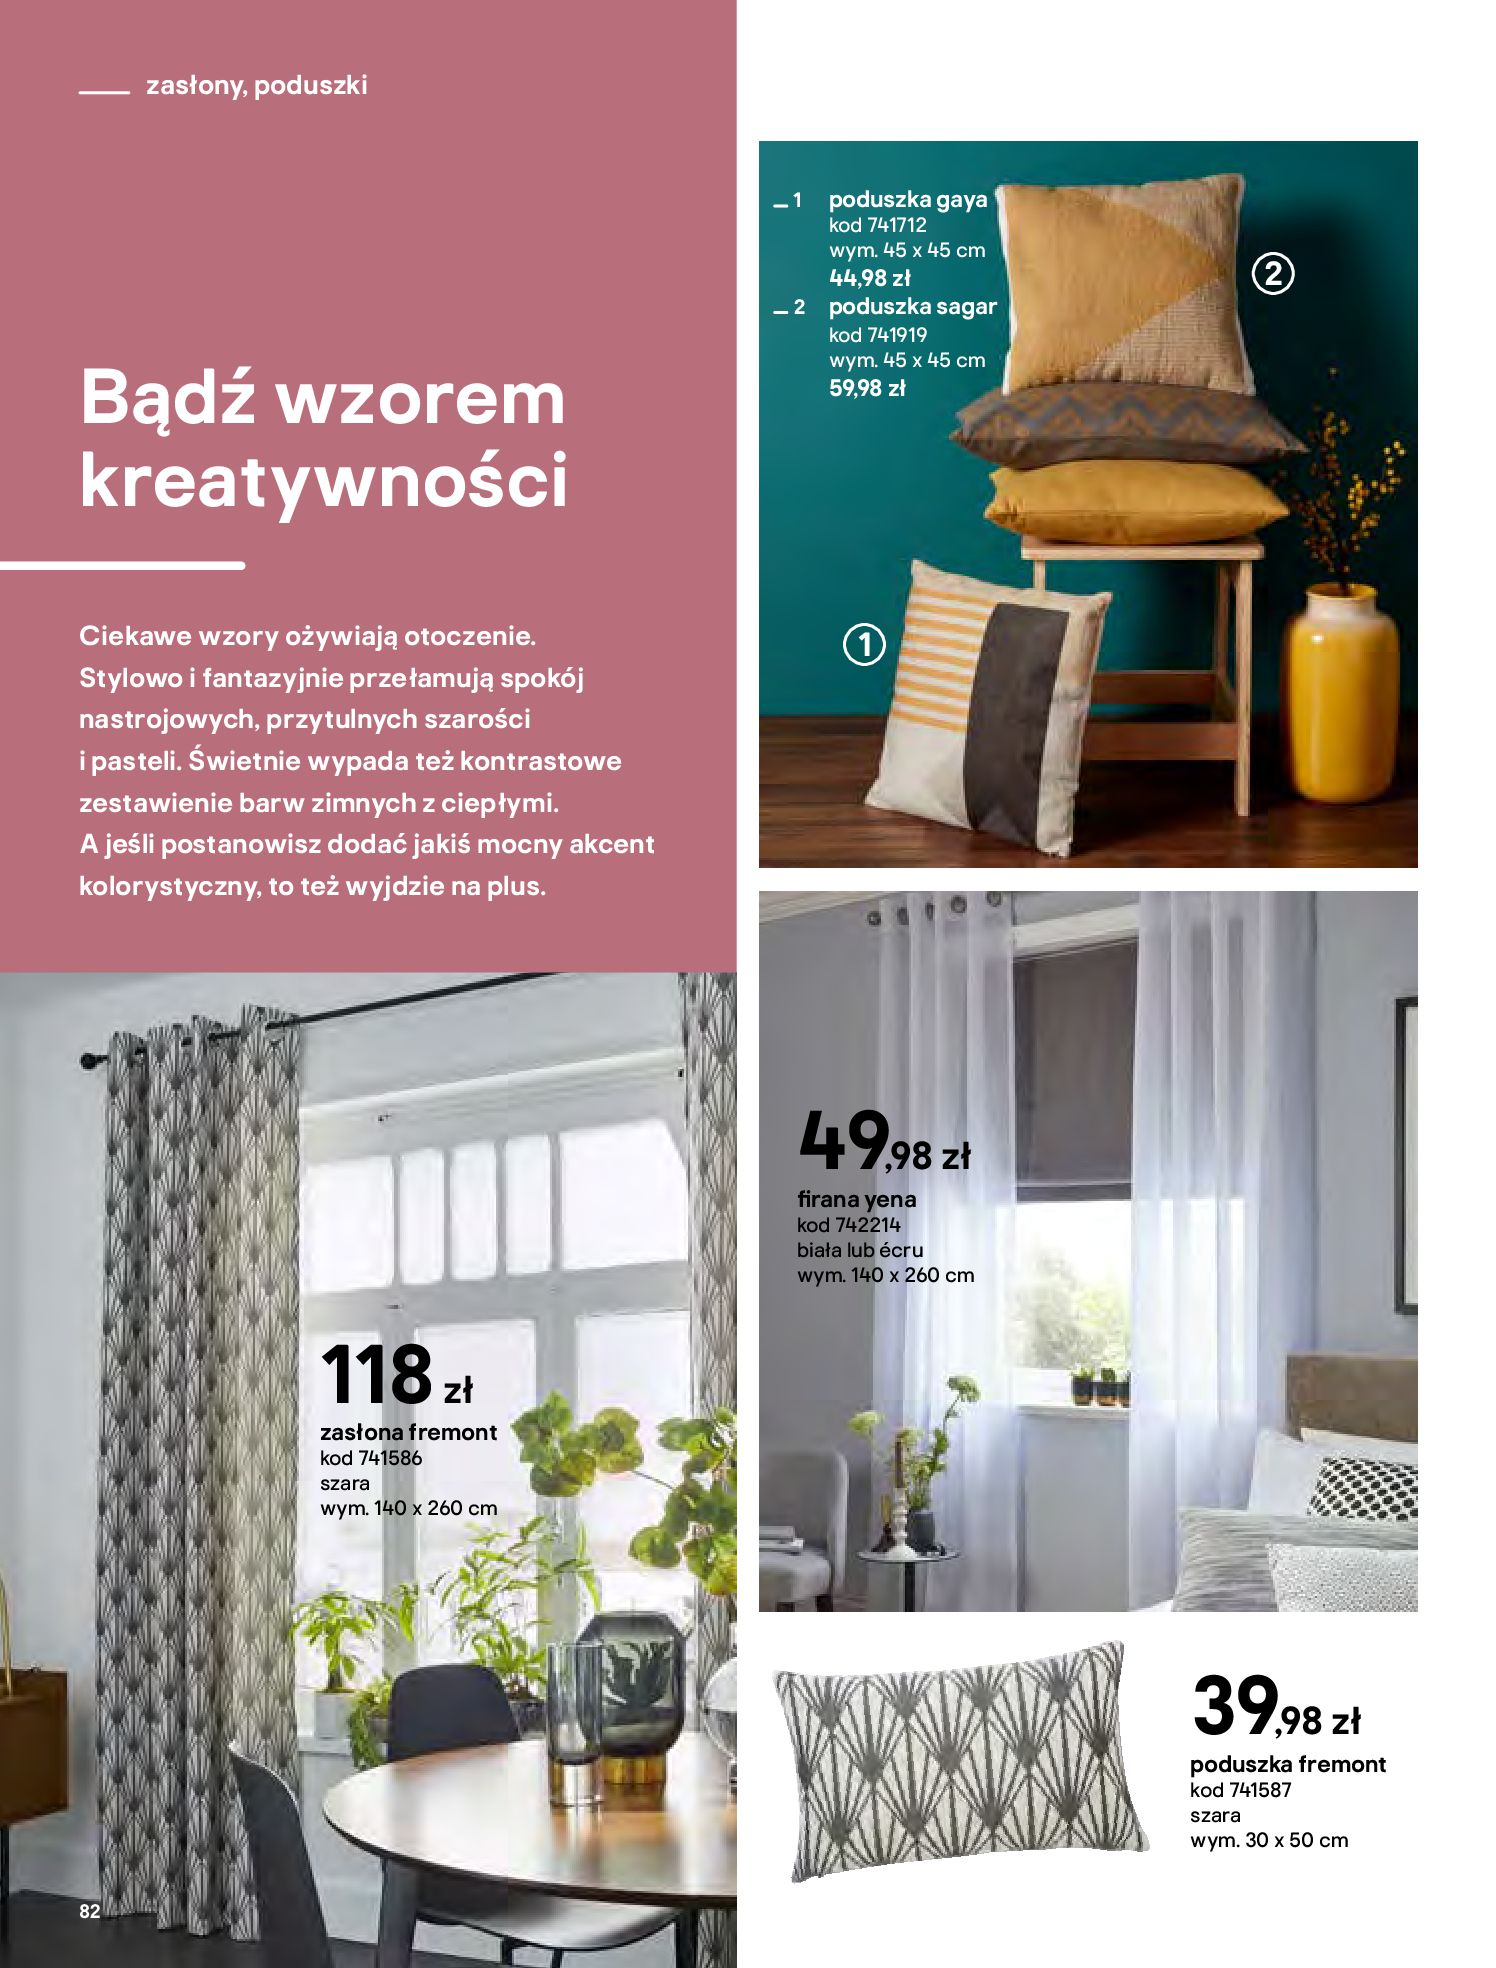 Gazetka Castorama - Katalog Dekoracje-22.10.2020-31.12.2020-page-82